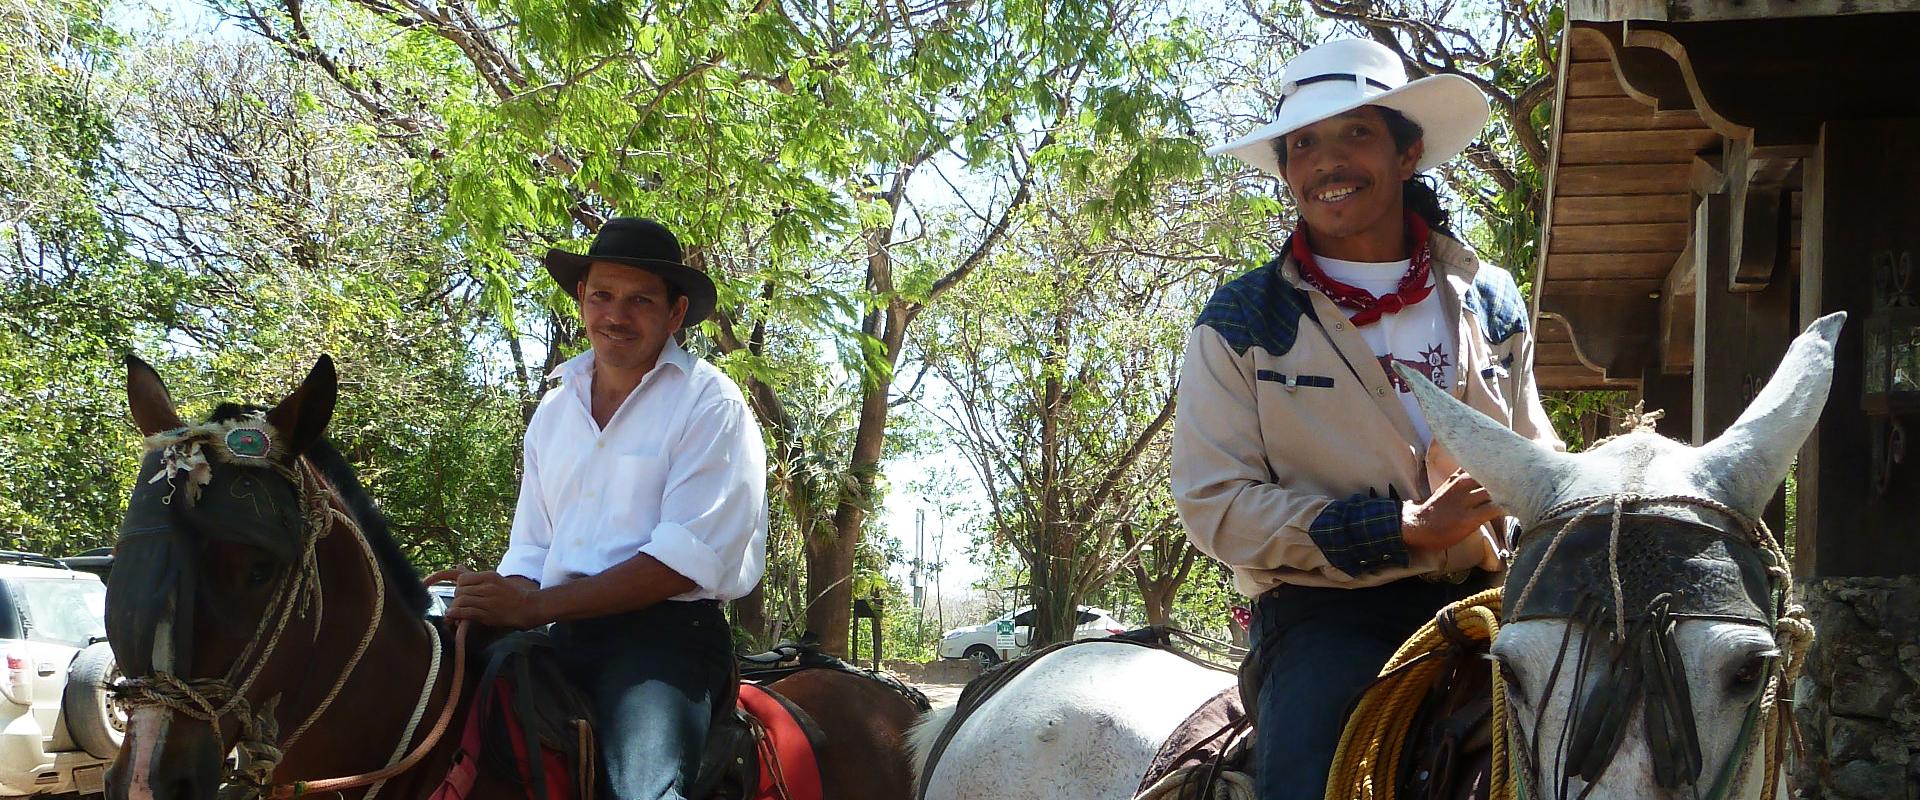 Costa Rica |Vaqueros